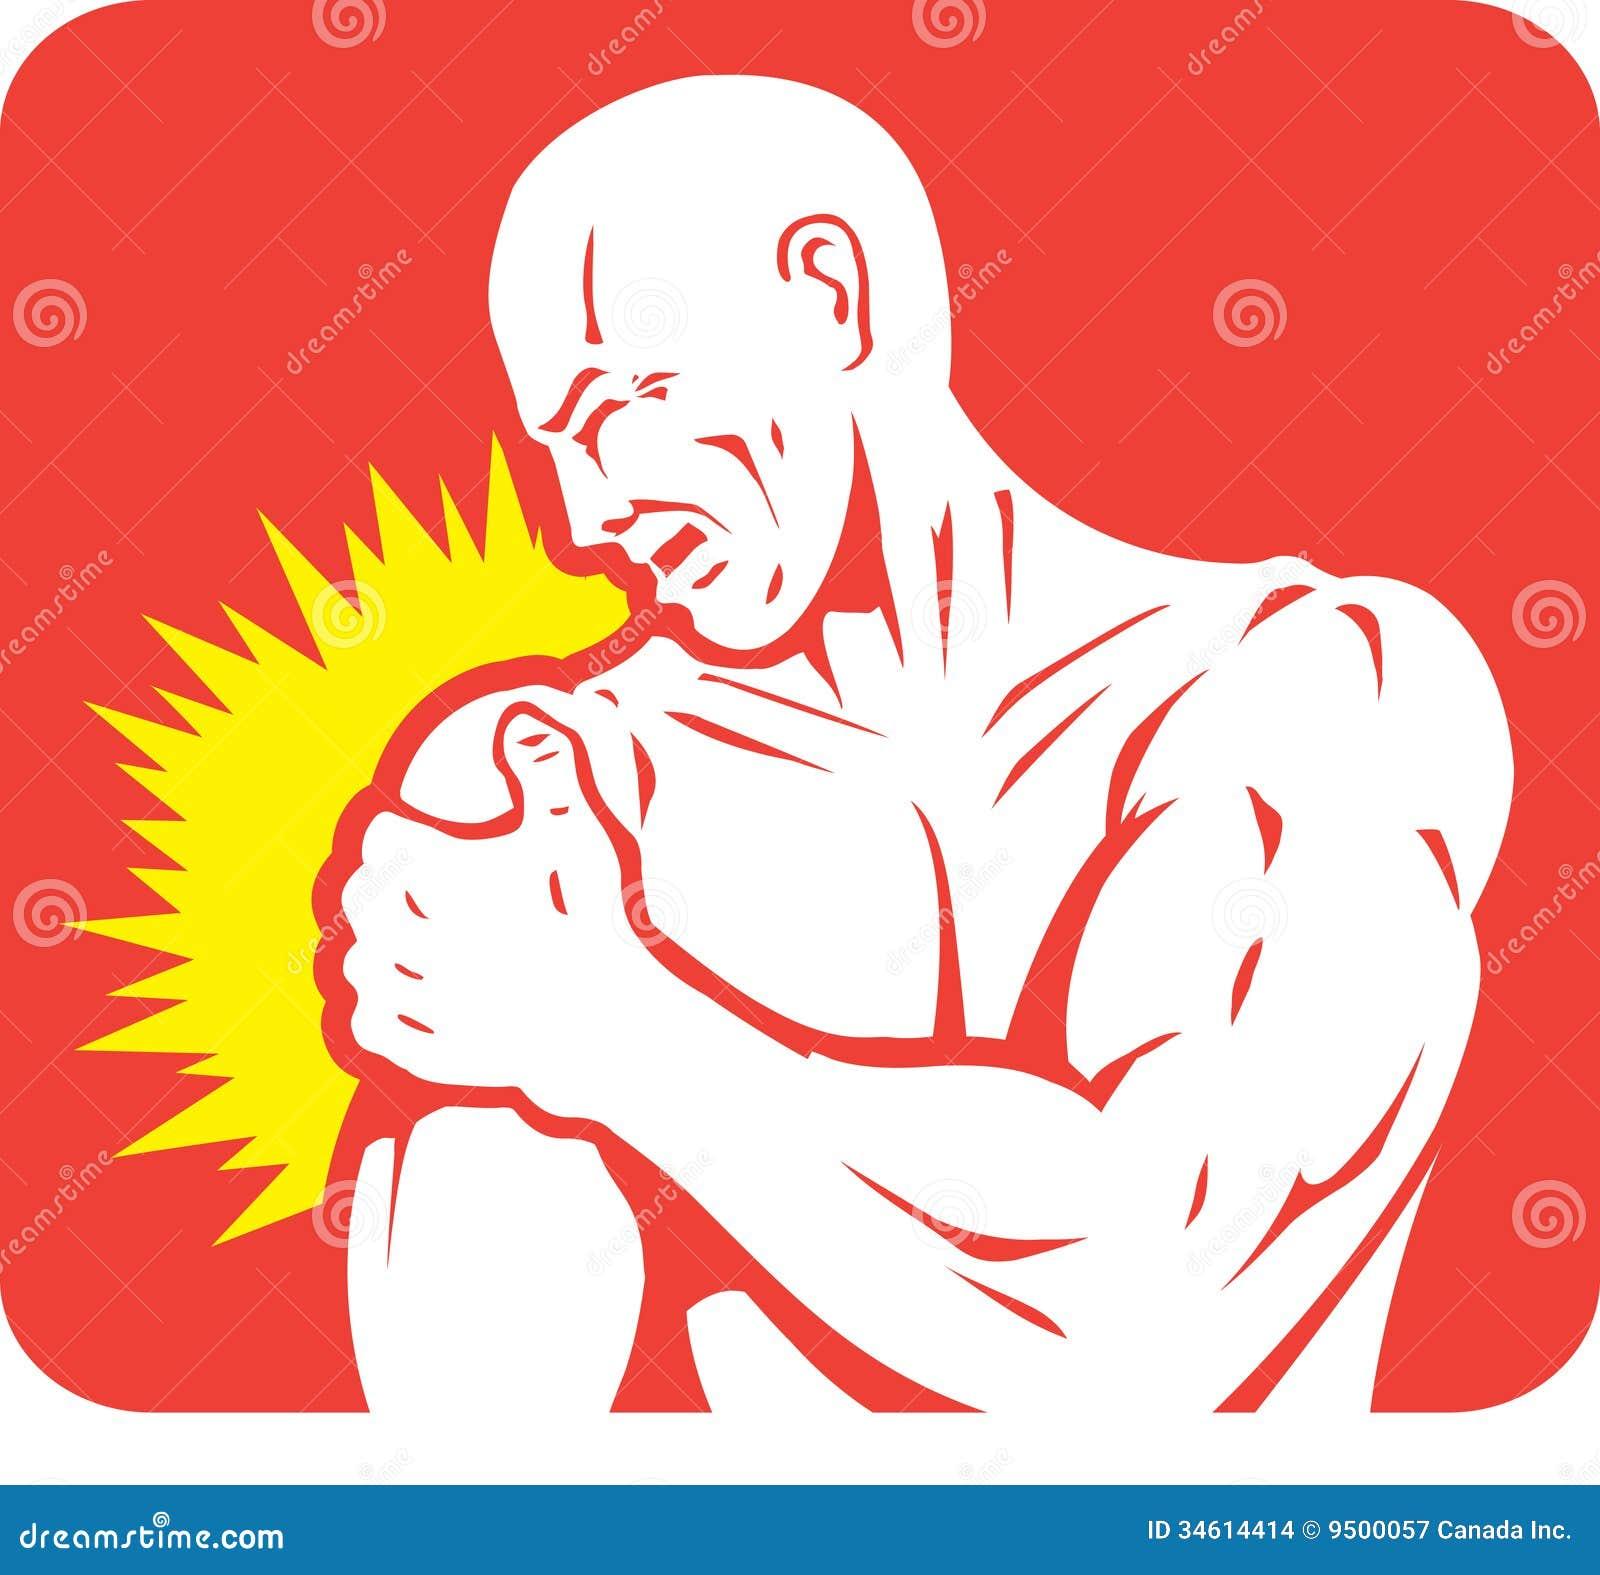 Shoulder clicking no pain